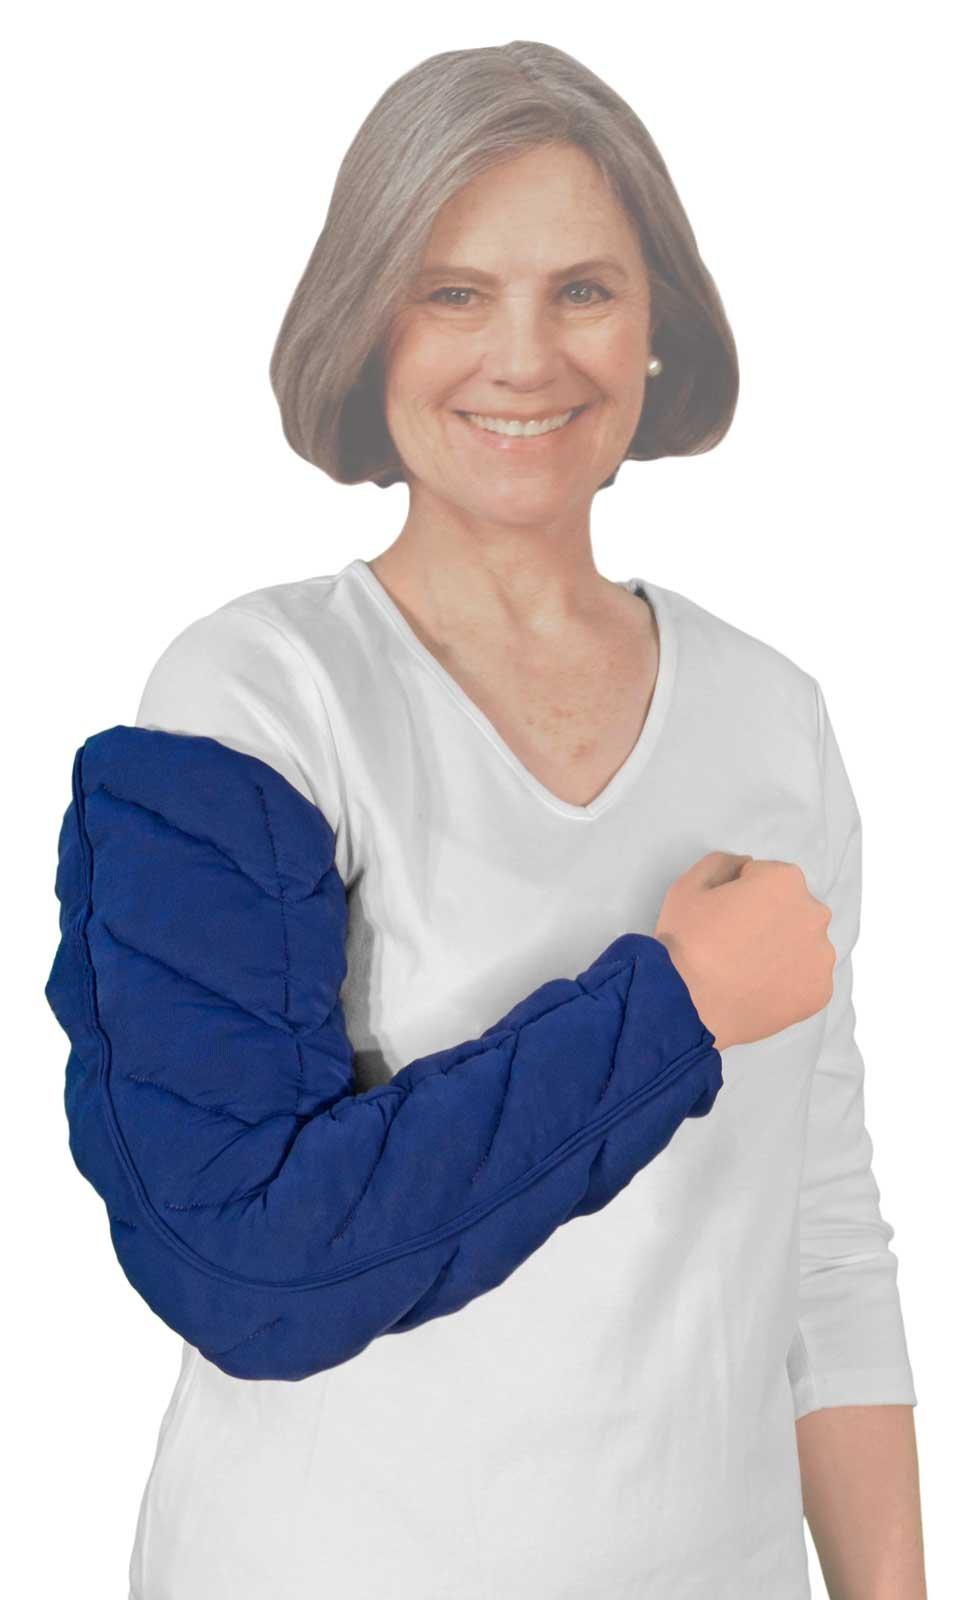 Caresia Lymphedema Arm Bandaging Liner Wrist to Axilla - Right Arm, Medium